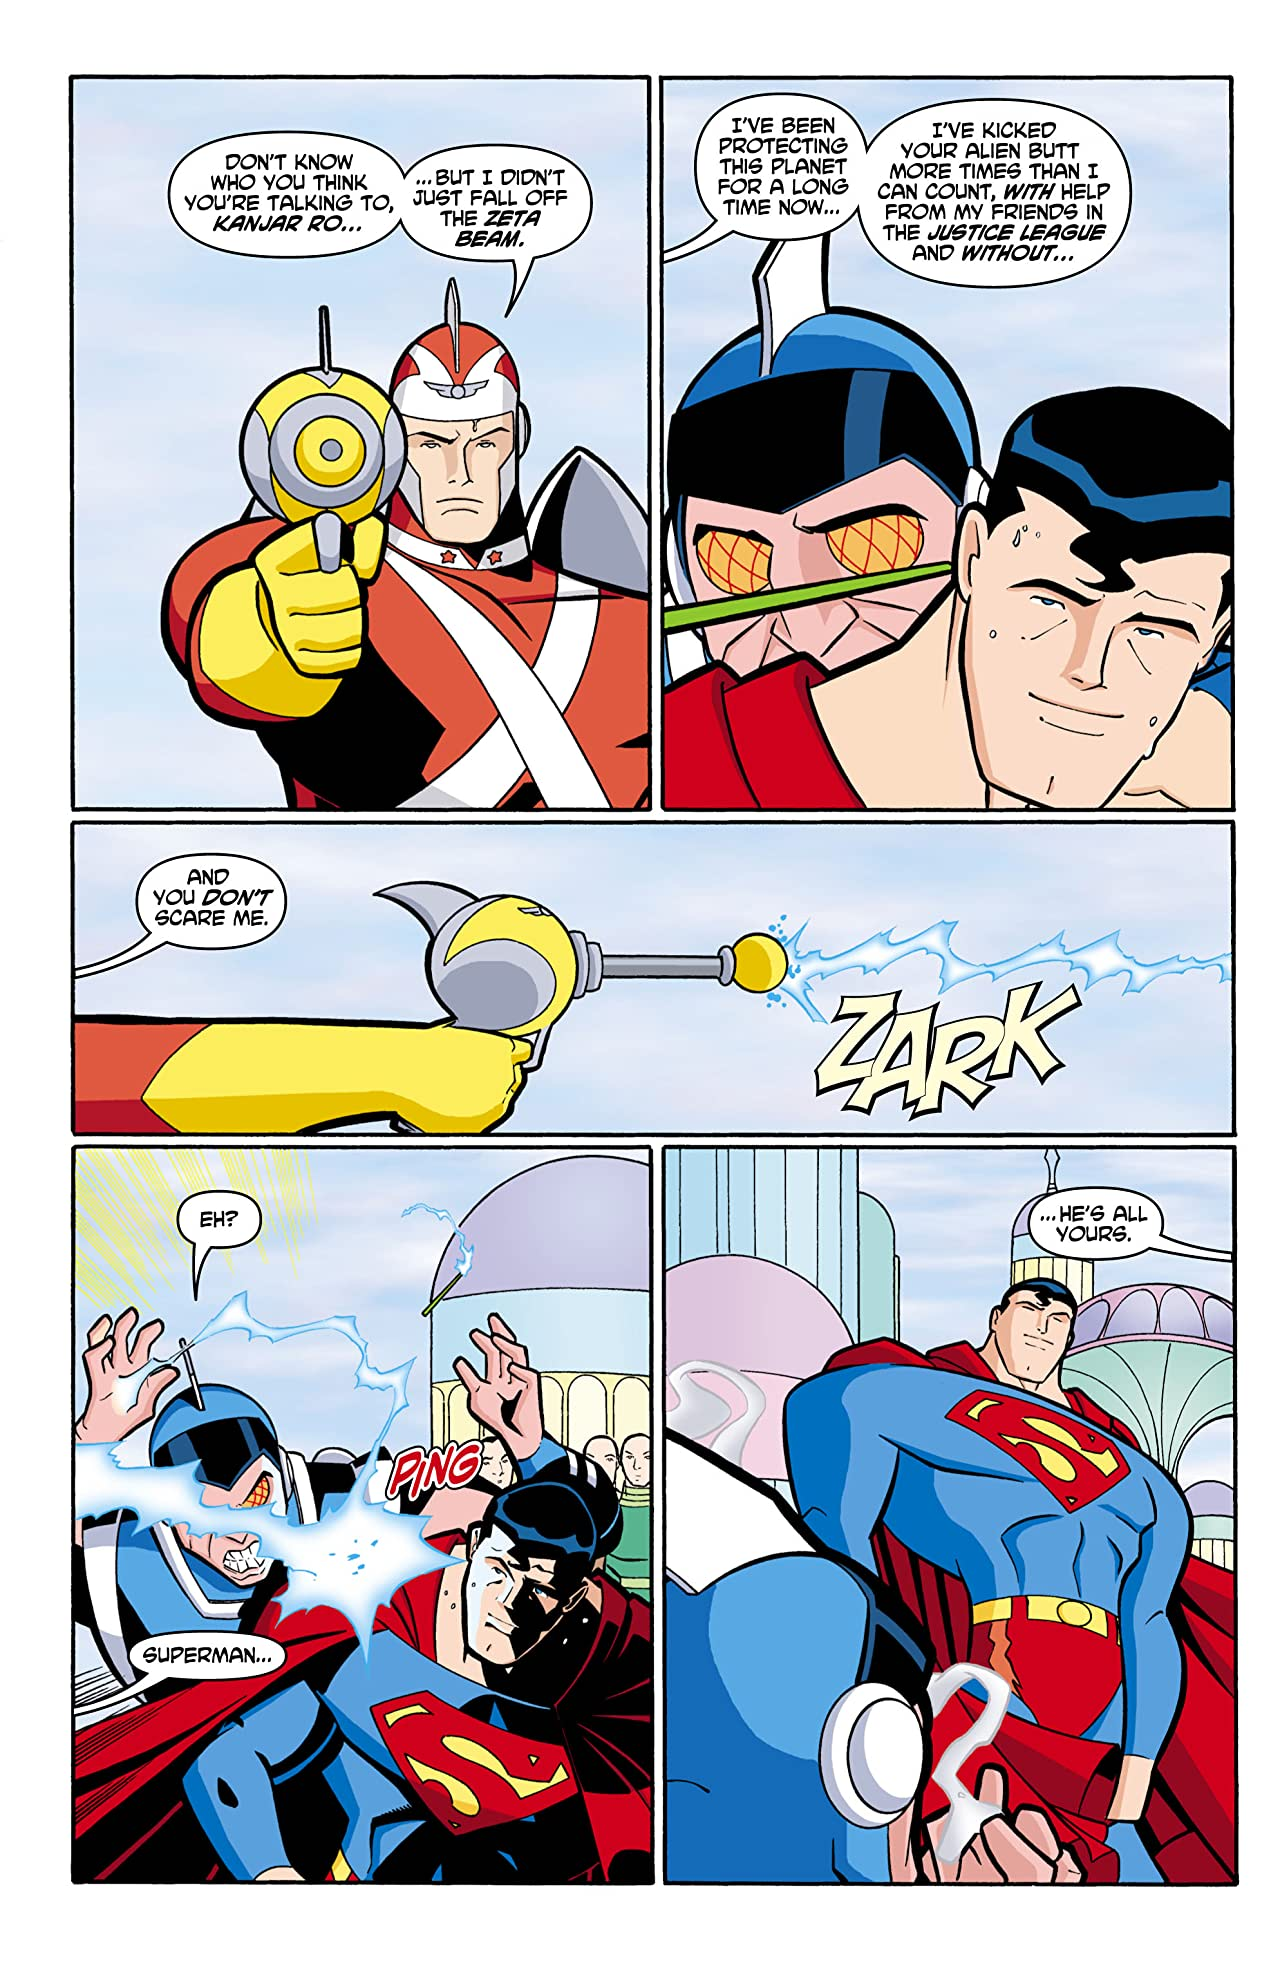 Justice League Unlimited #4